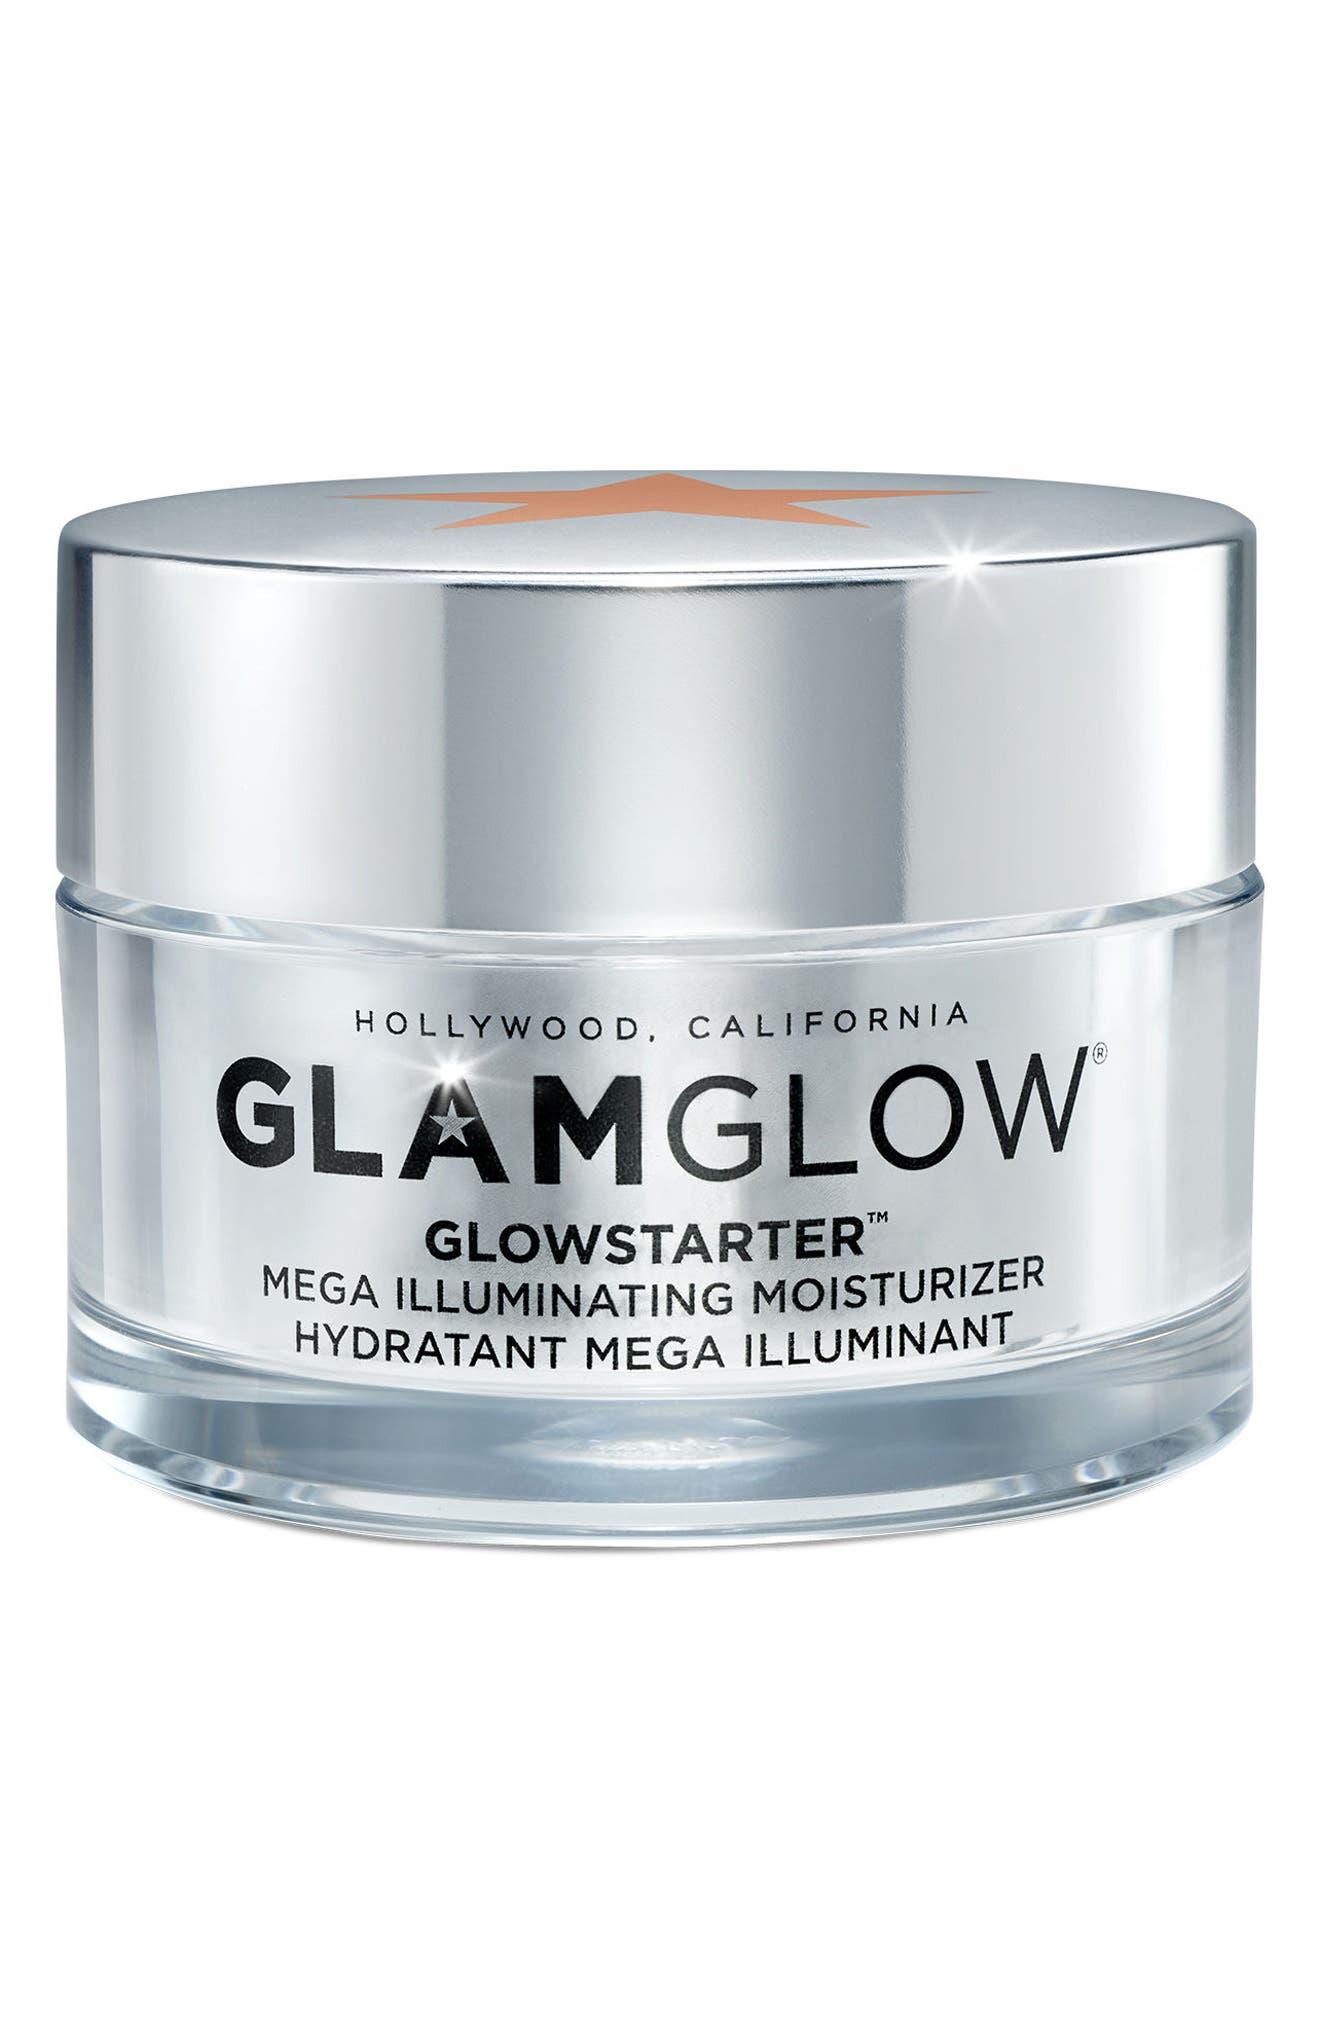 Glamglow Glowstarter(TM) Mega Illuminating Moisturizer